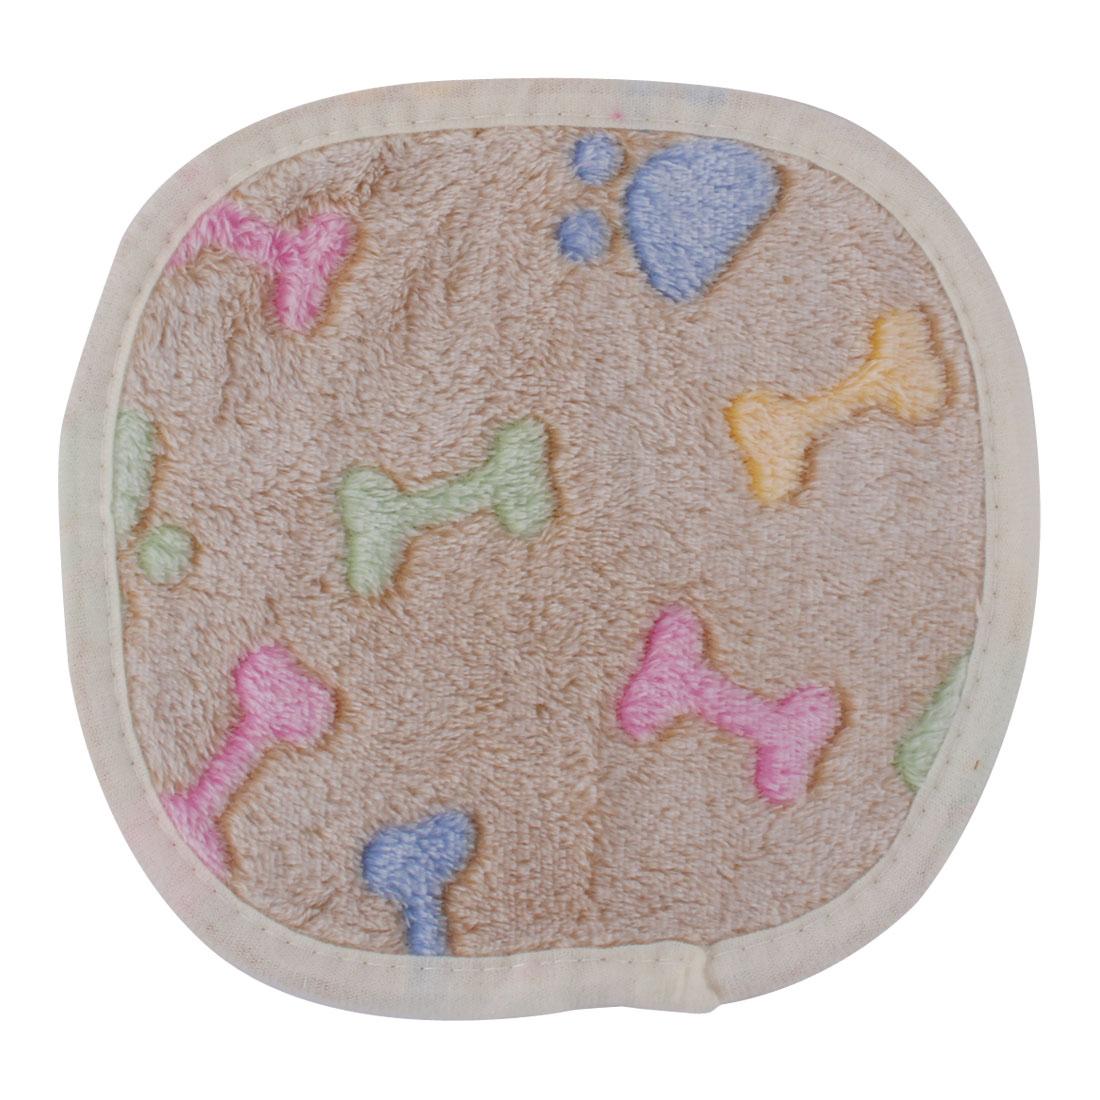 Pet Flannel Bone Print Hedgehog Bed Cushion Soft Warm Blanket Light Brown